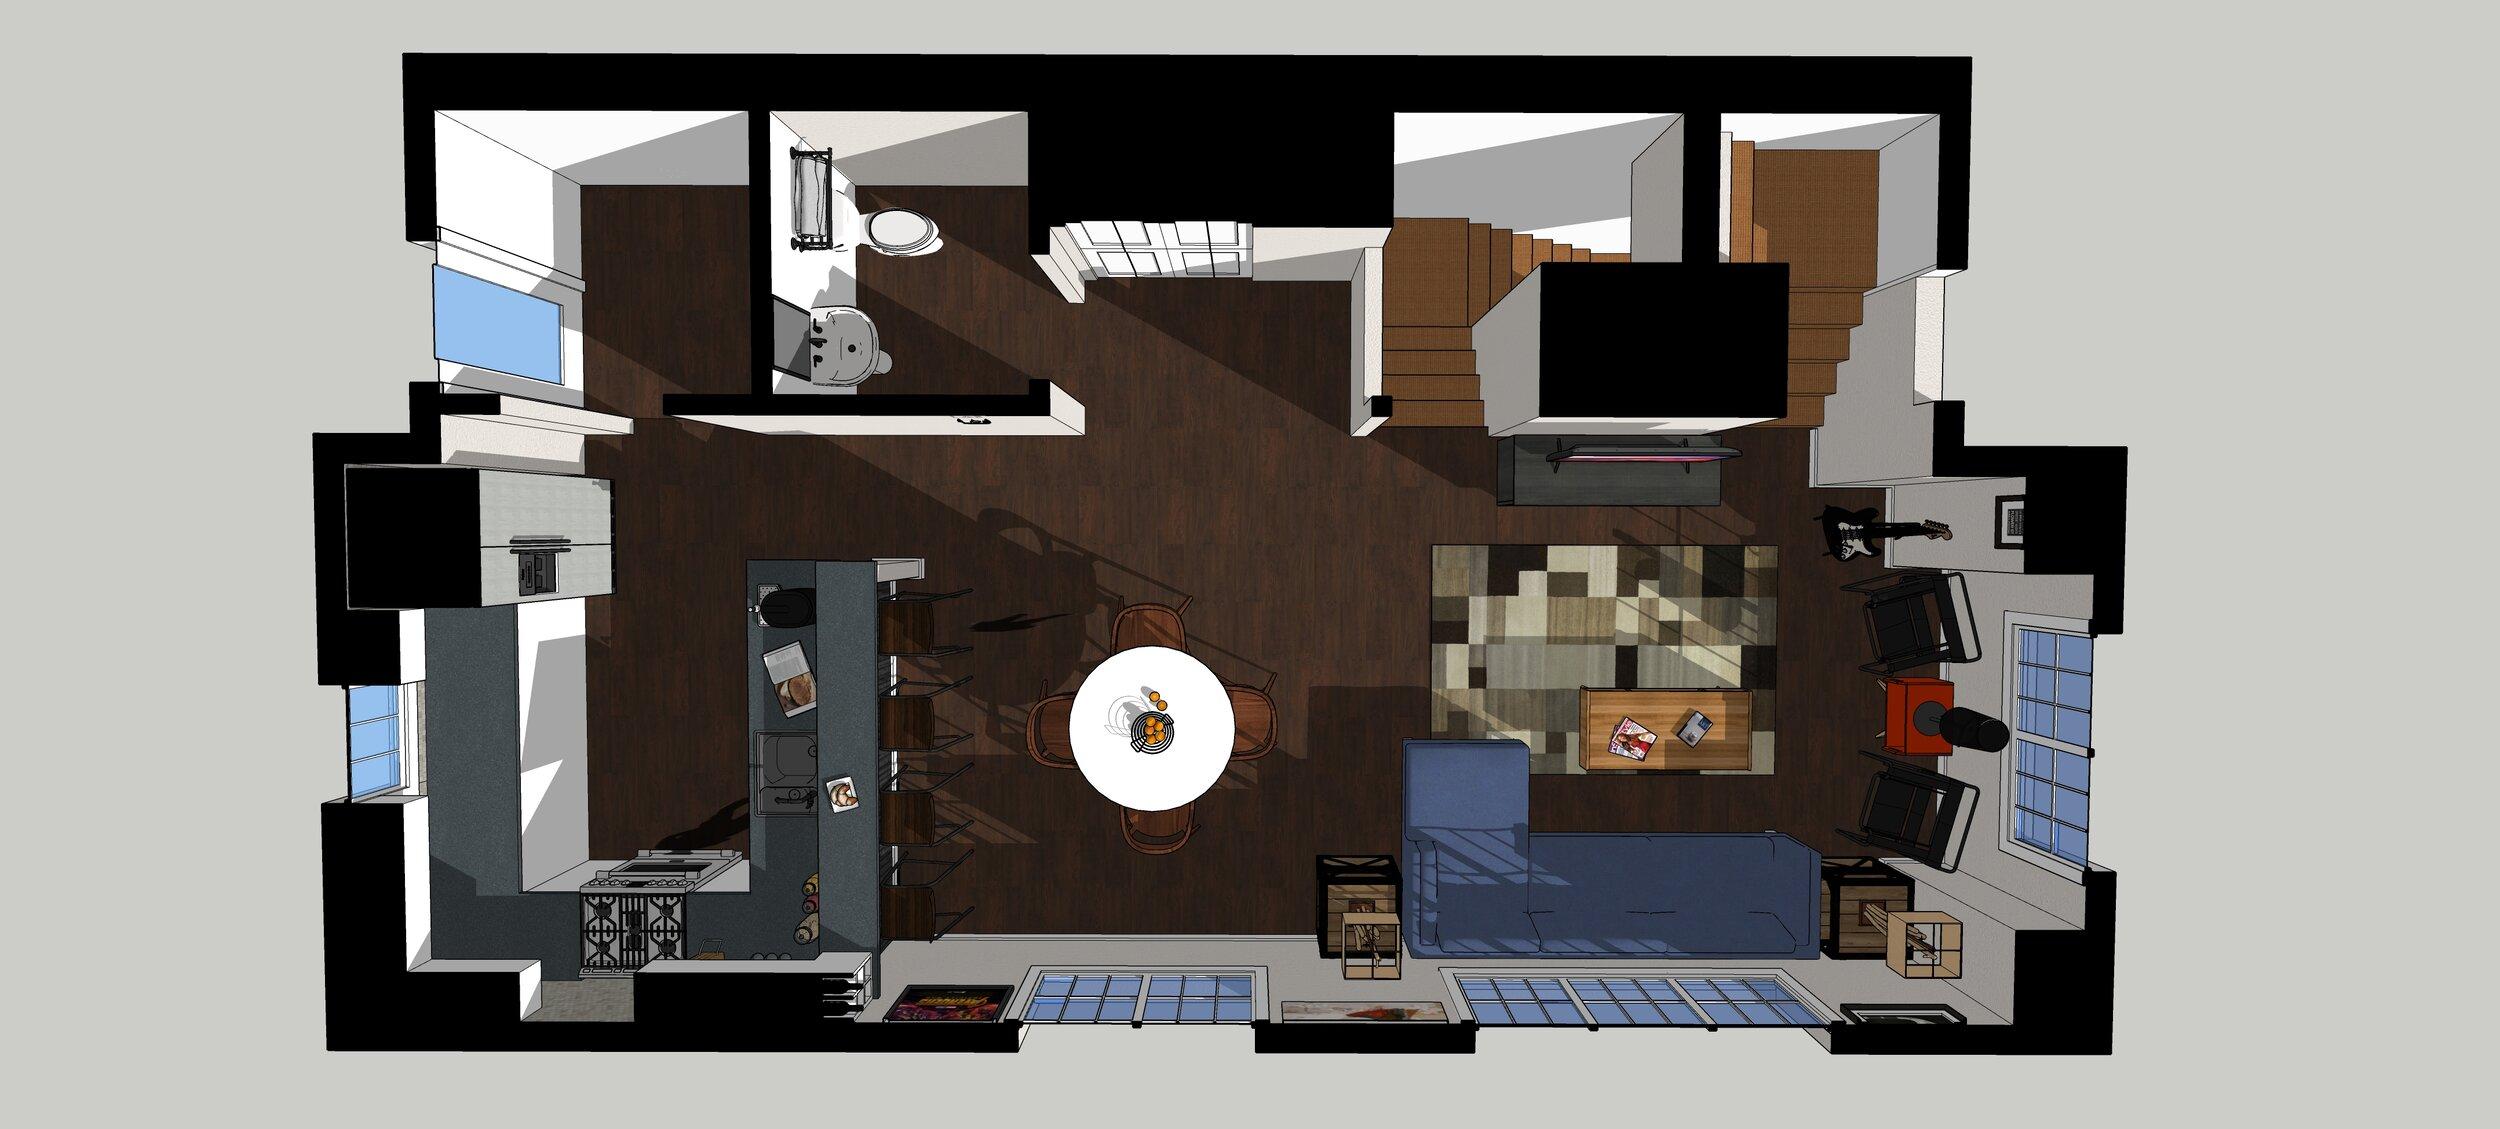 pier st interior-plan.jpg